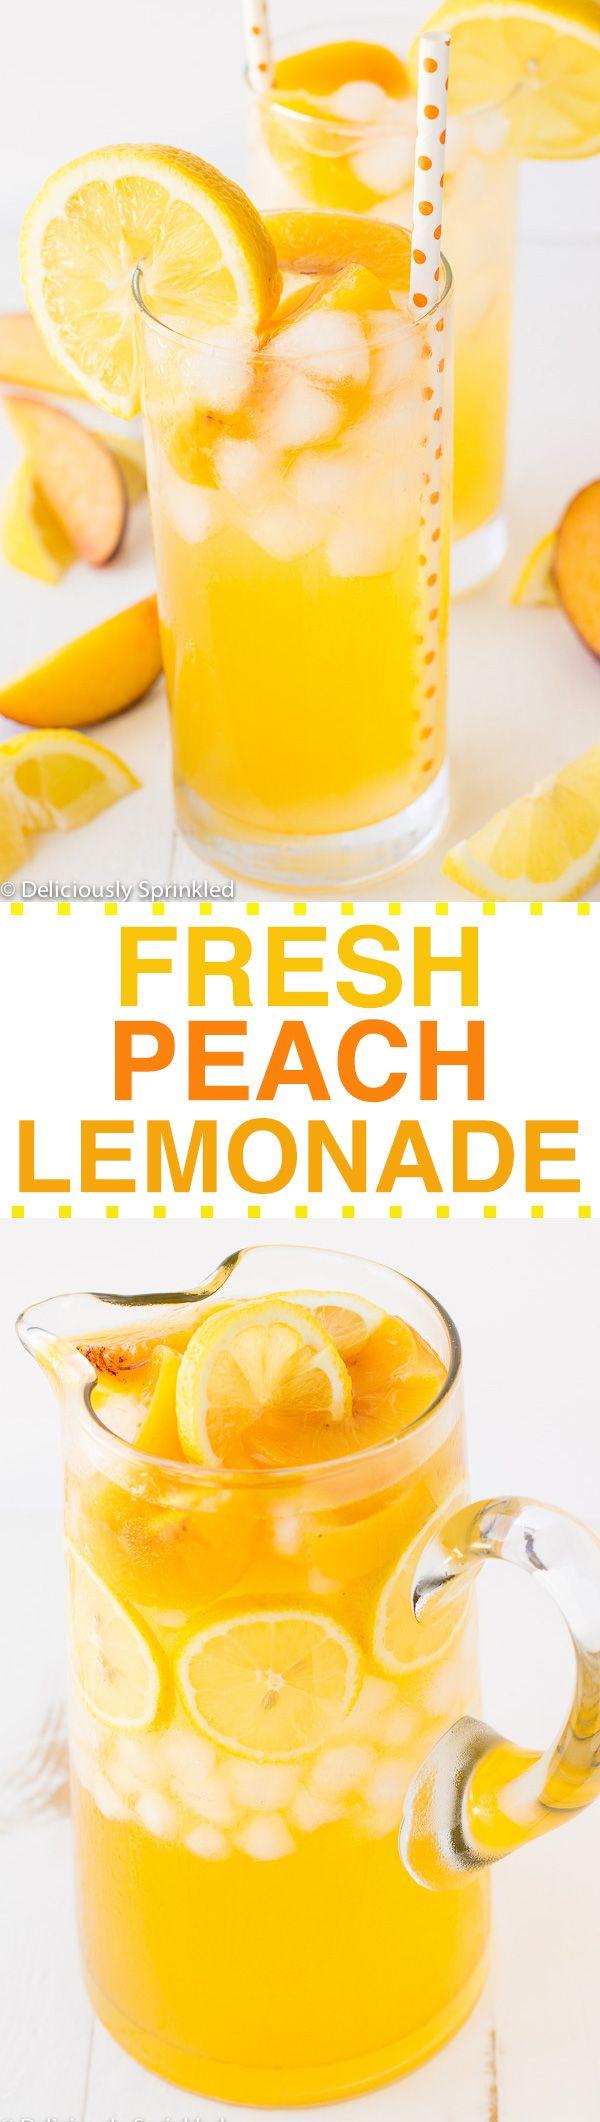 FRESH PEACH LEMONADE RECIPE ~ Deliciously Sprinkled